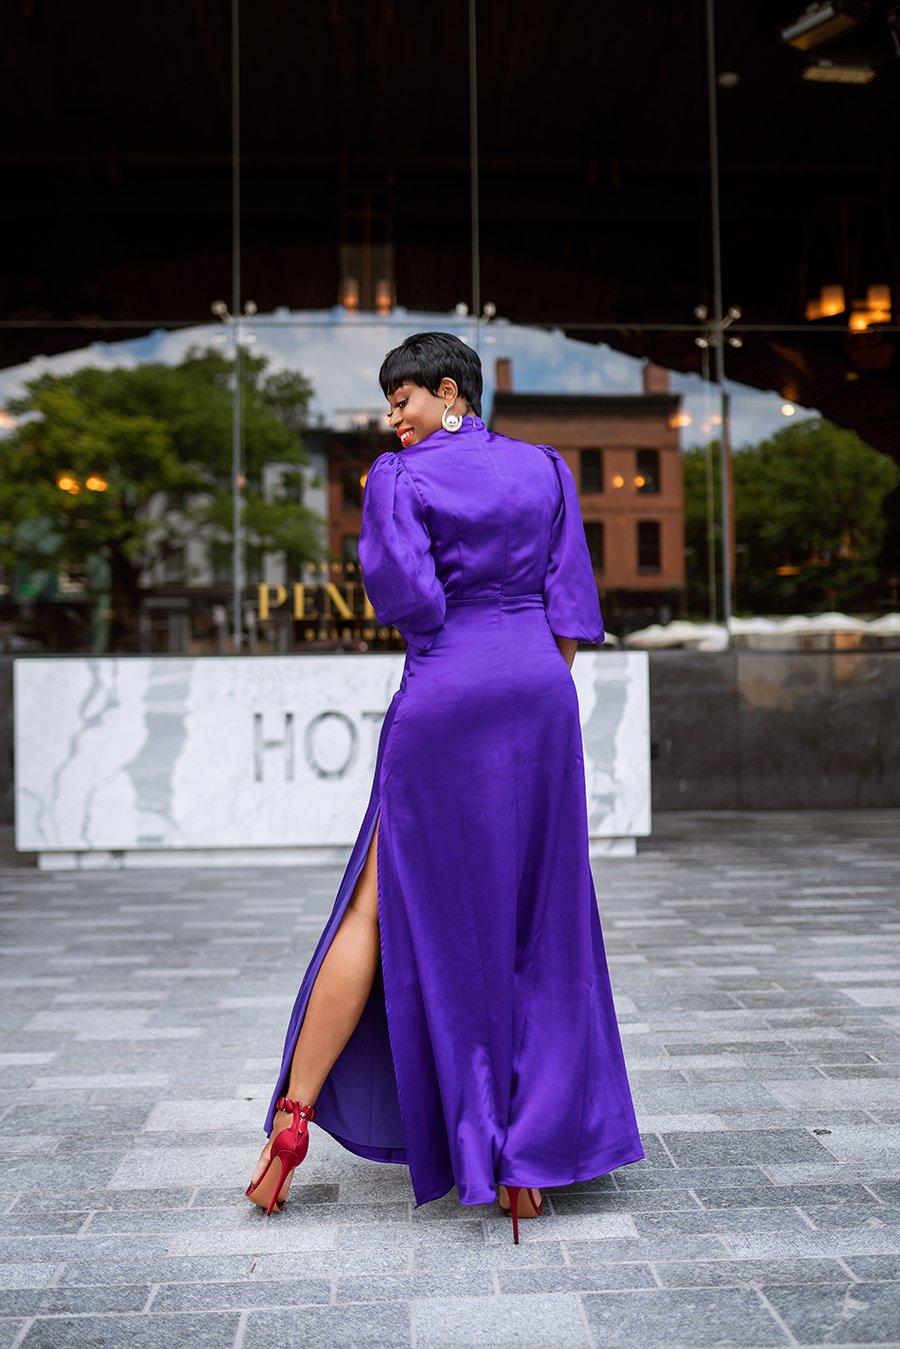 stella-adewunmi-of-jadore-fashion-share-virgos-lounge-vlabel-purple-dress